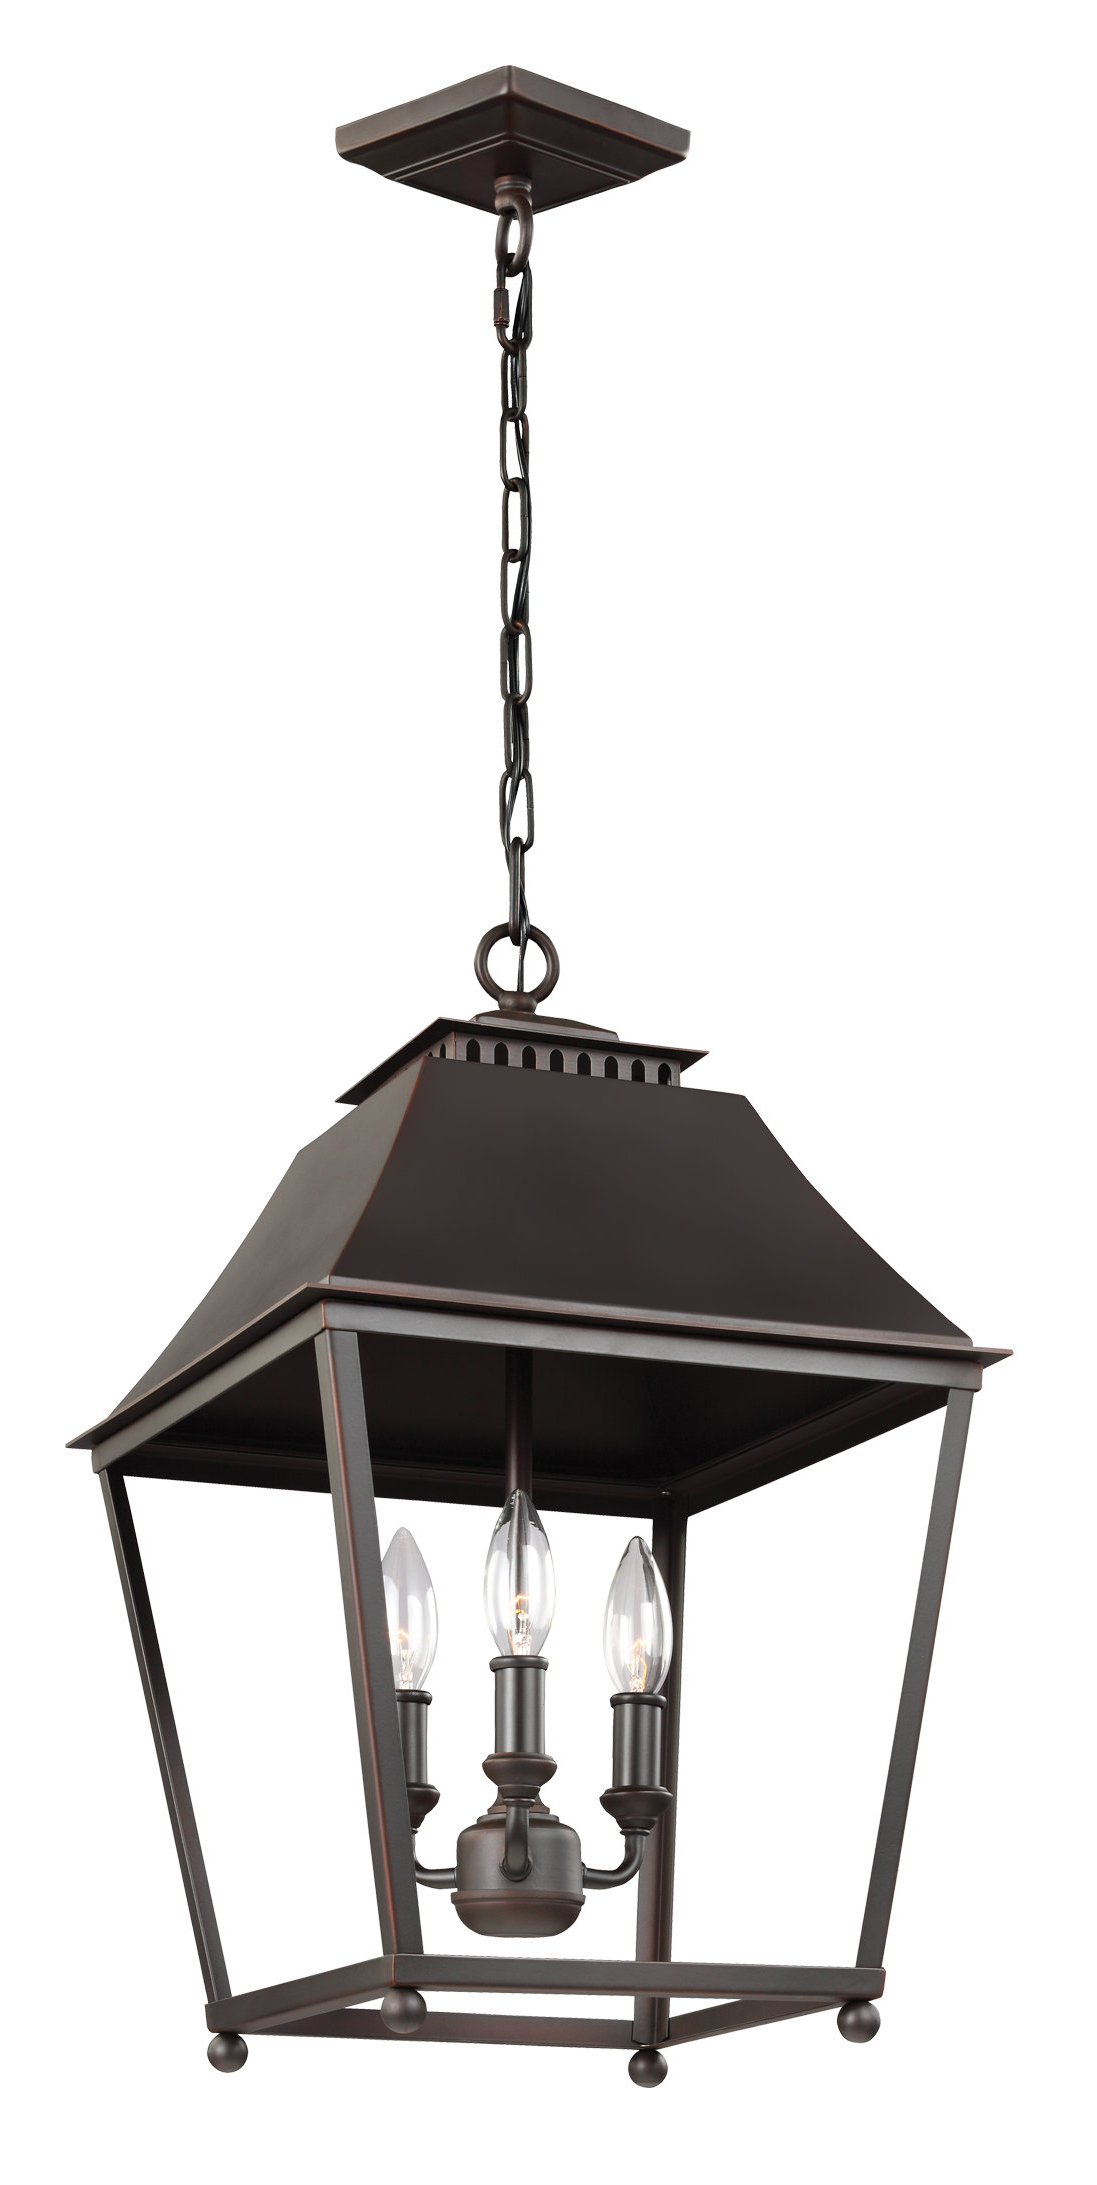 Preferred Armande 3 Light Lantern Geometric Pendants With Regard To Gracie Oaks Darwin 3 Light Lantern Geometric Pendant (View 21 of 25)